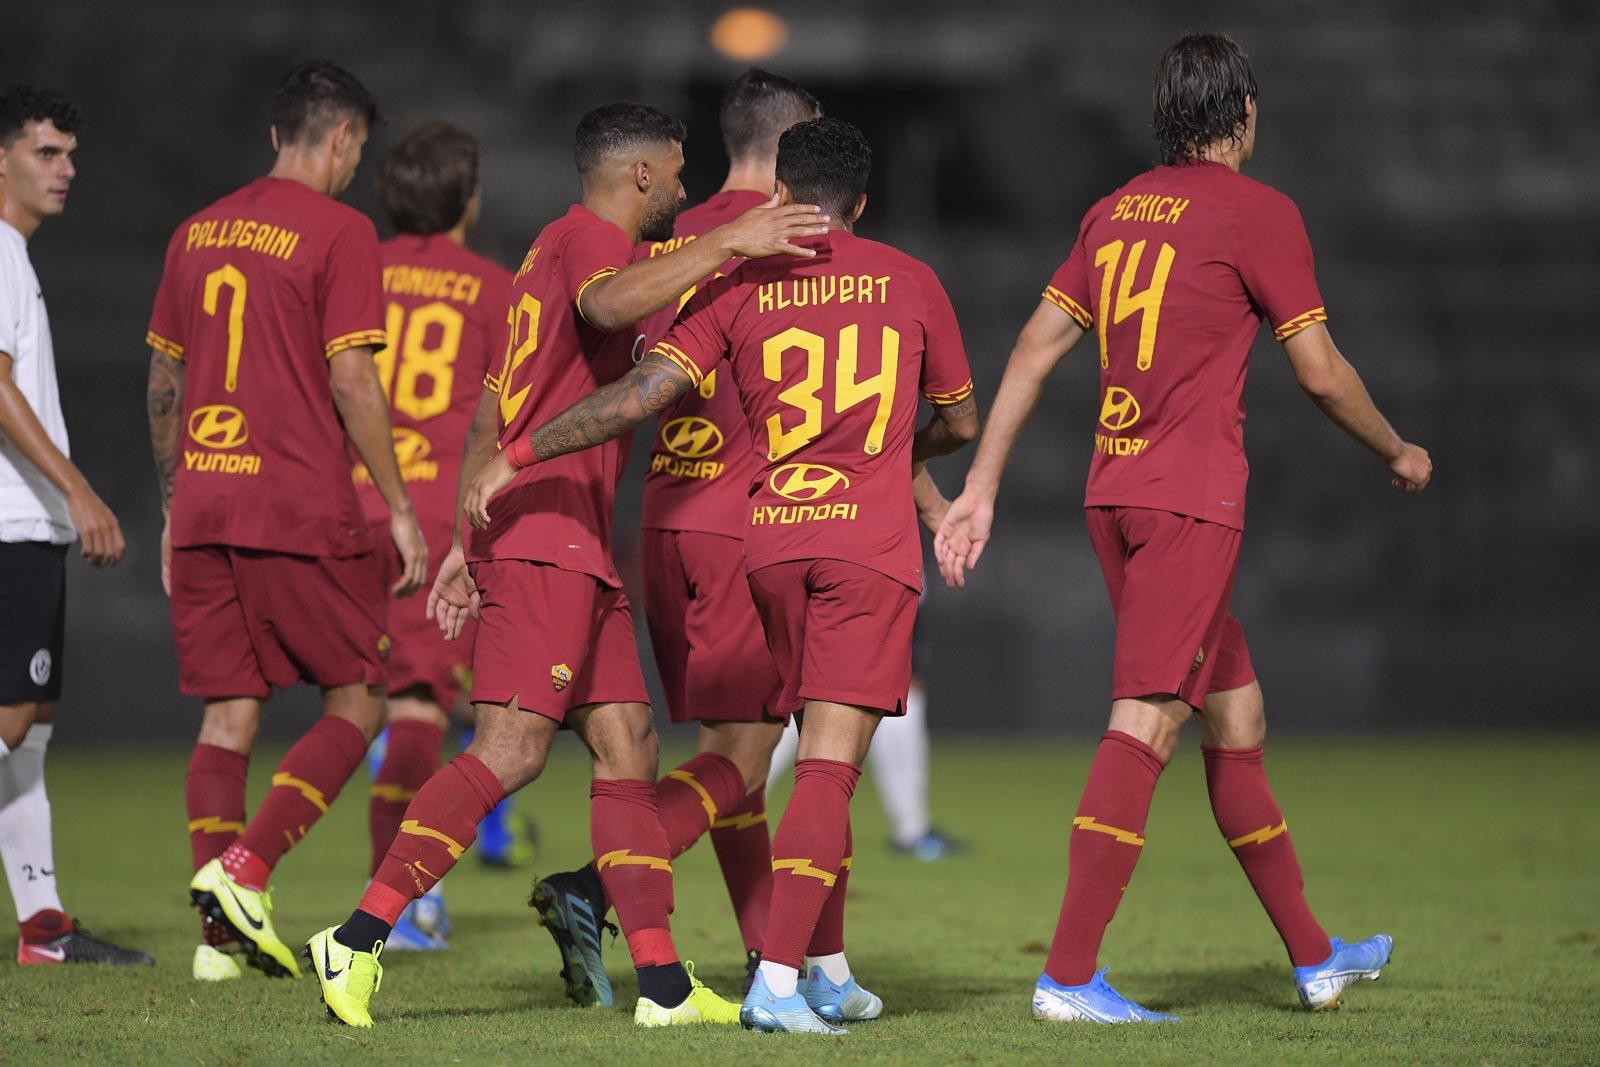 Daftar Nama Pemain AS Roma Musim 2019 2020 Ligalaga